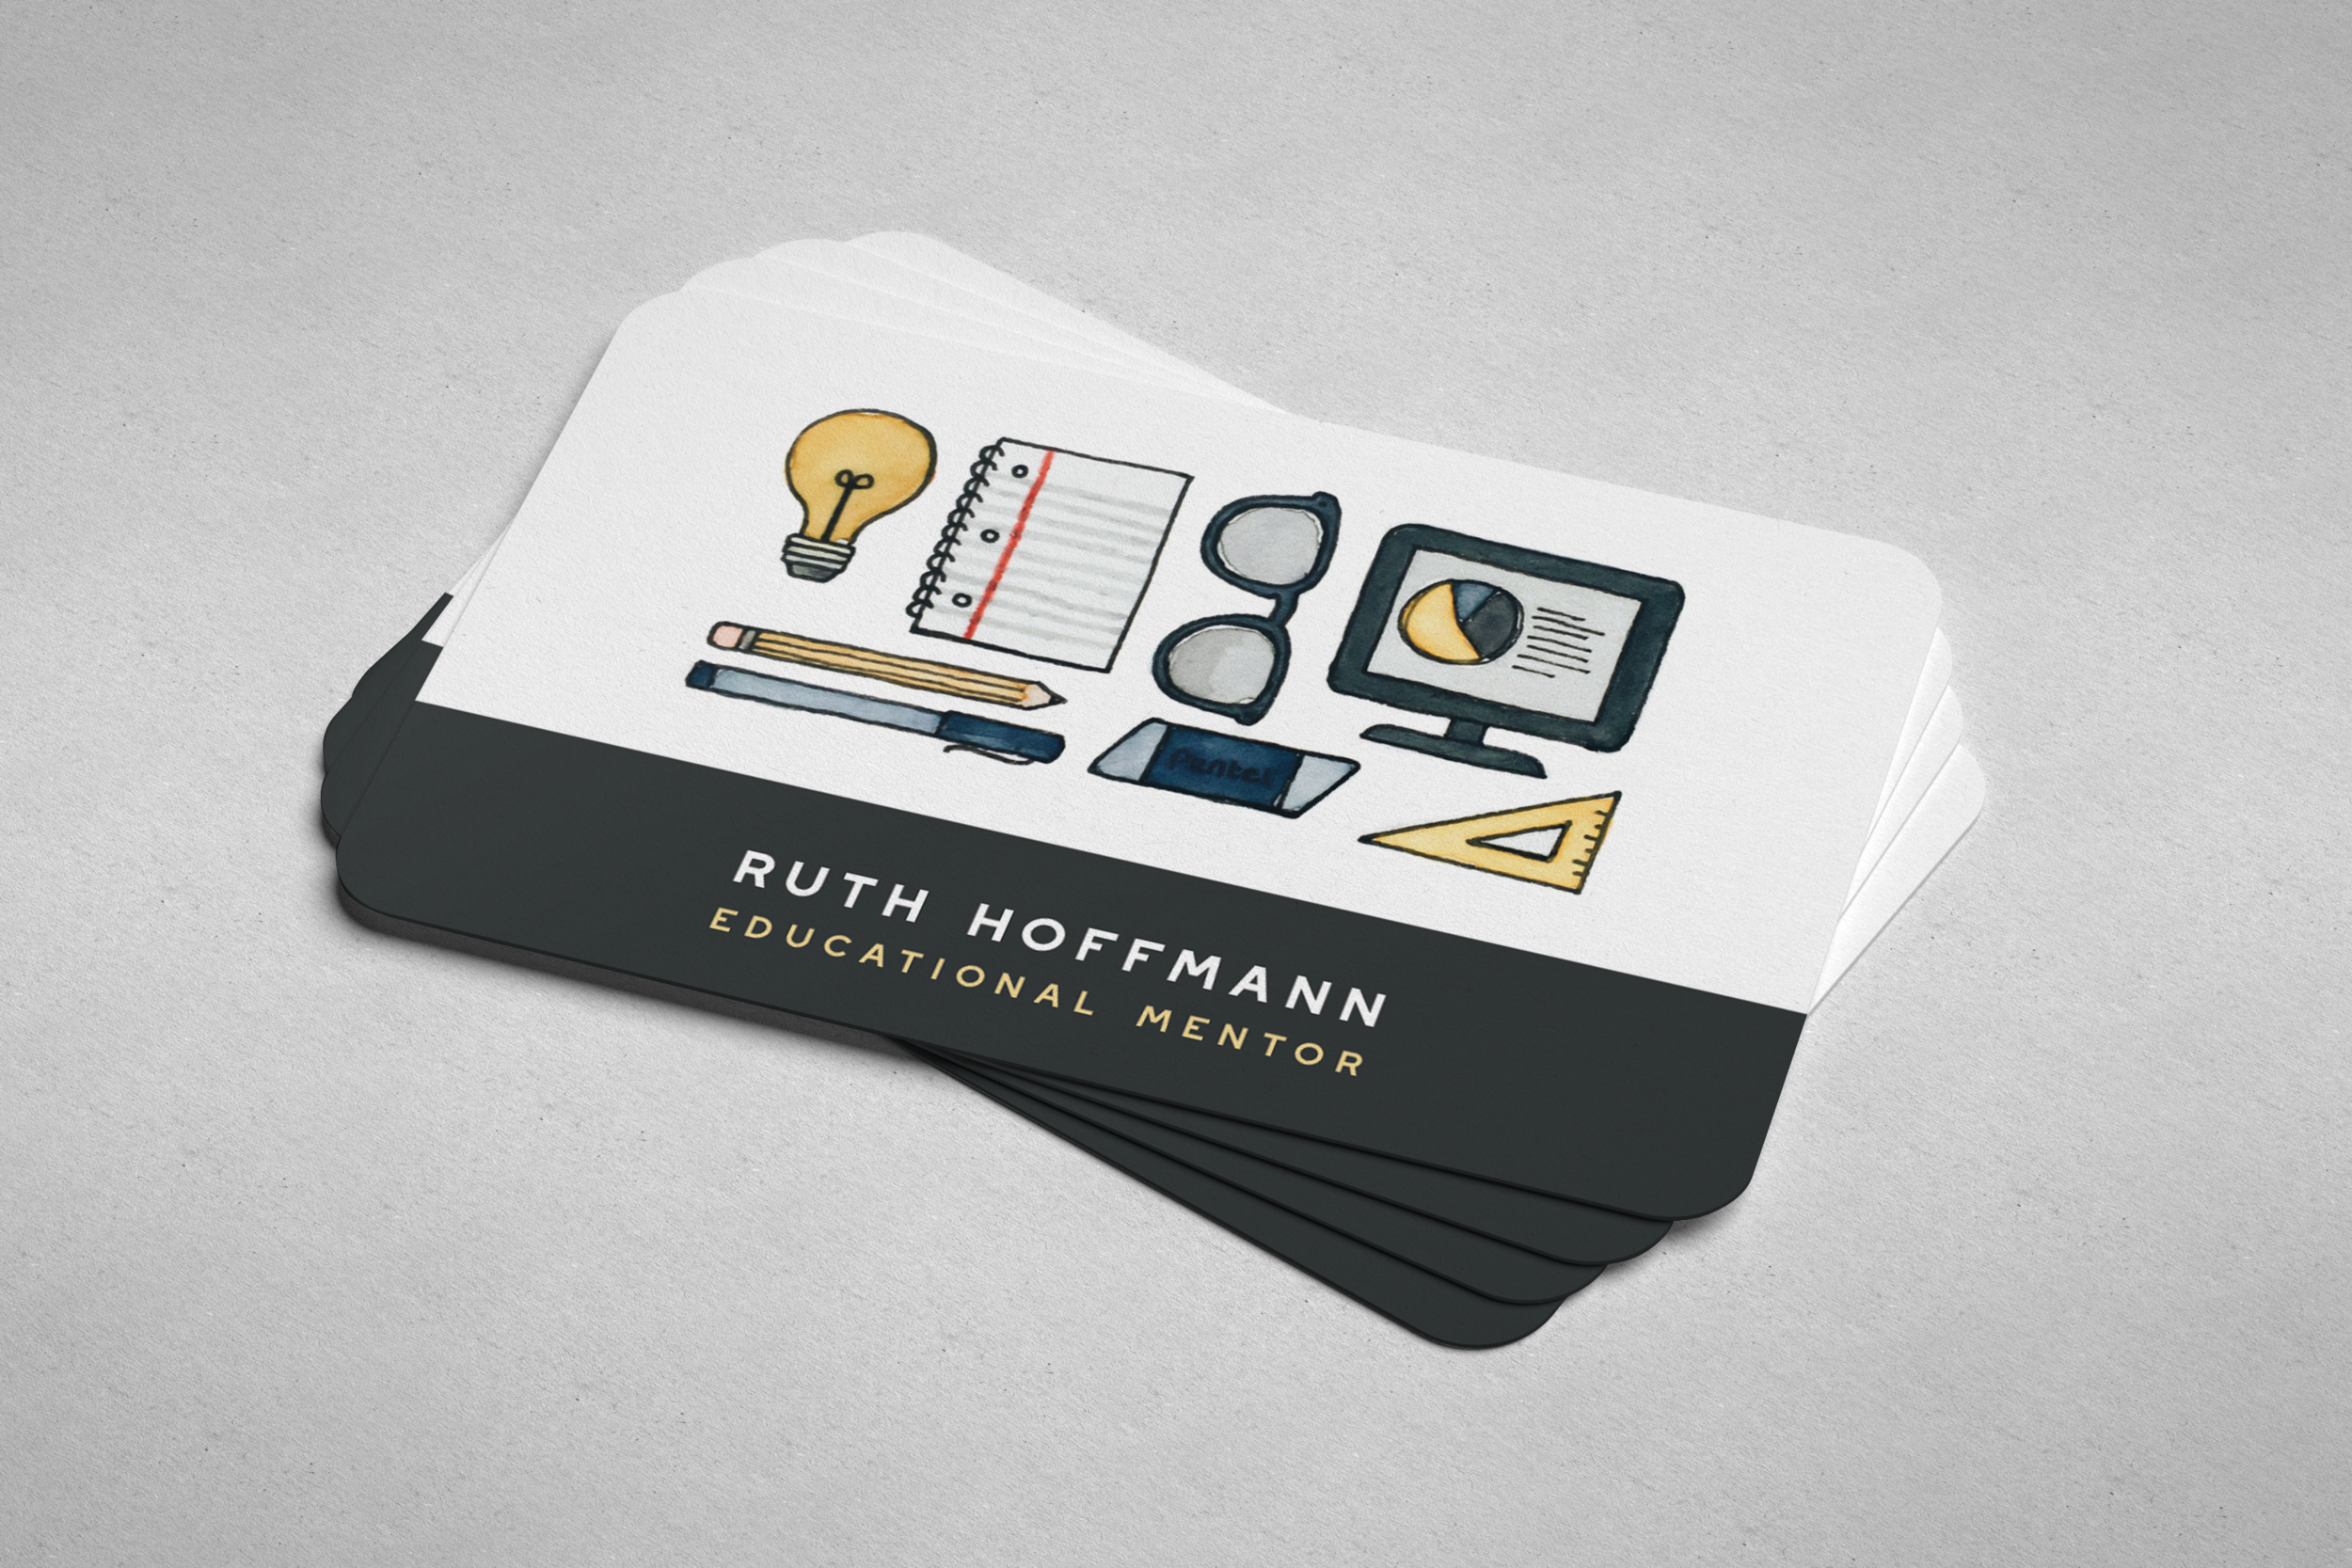 Business_Card_Mockup_1.png